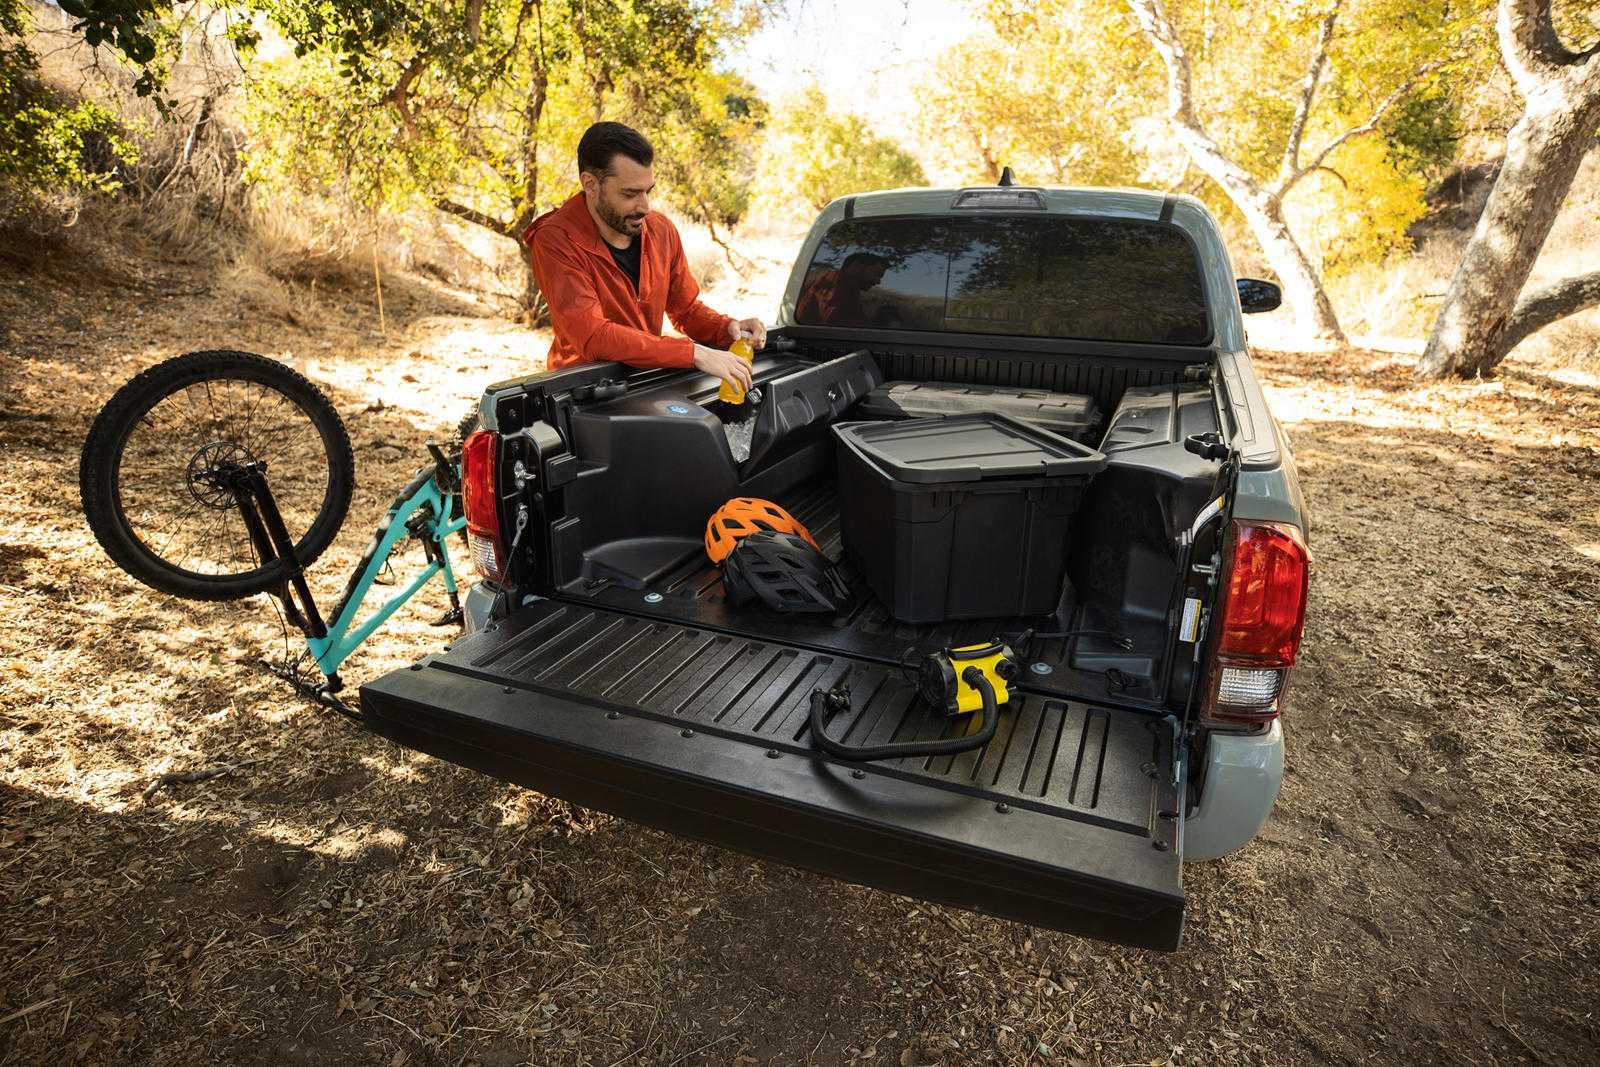 Toyota-Tacoma-Trail-Edition-bán-tải-off-road-giá-rẻ (7).jpg